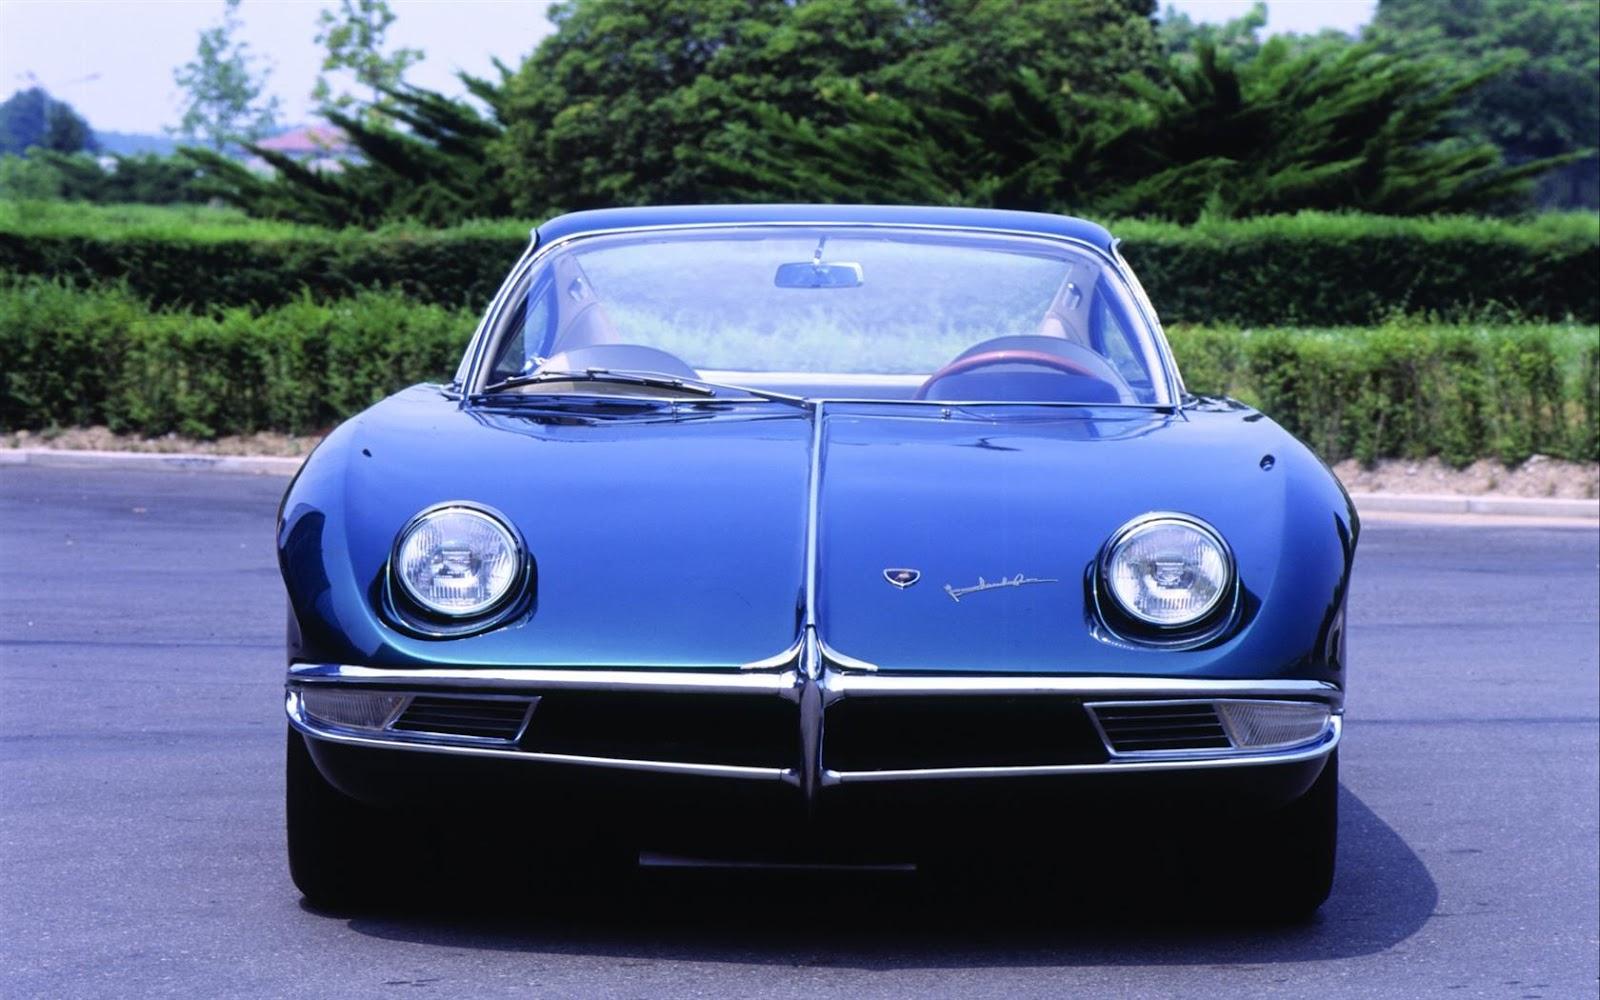 2018 Dodge Barracuda >> Classic Car Posters: Lamborghini 350 GTV Coupe